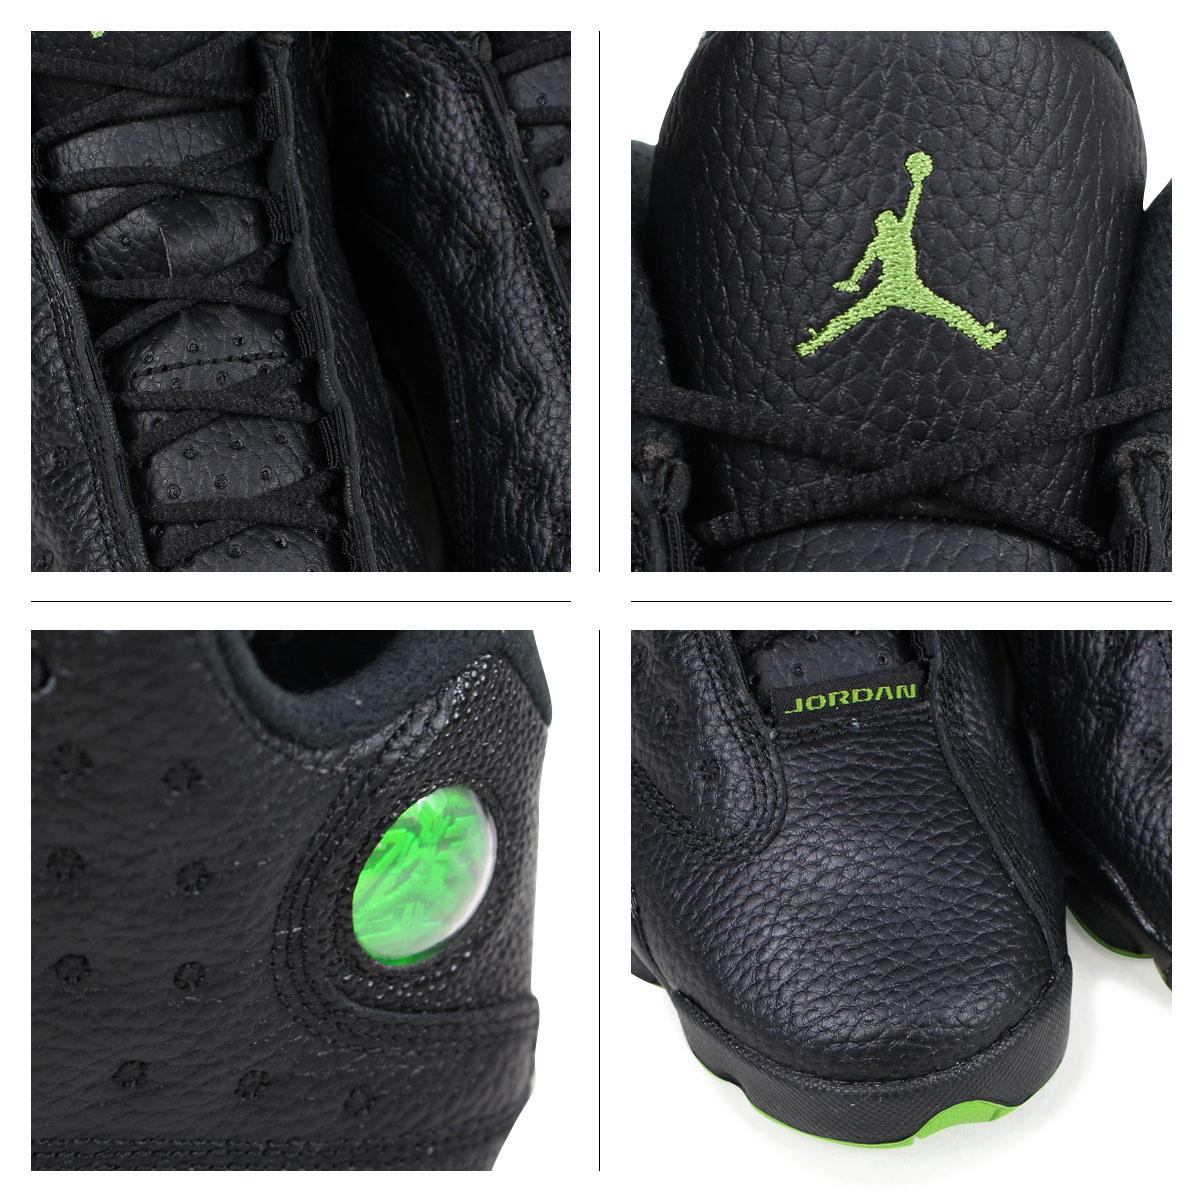 on sale d1354 eba92 ... NIKE AIR JORDAN 13 RETRO BG Nike Air Jordan 13 nostalgic lady s  sneakers 414,574-042 ...